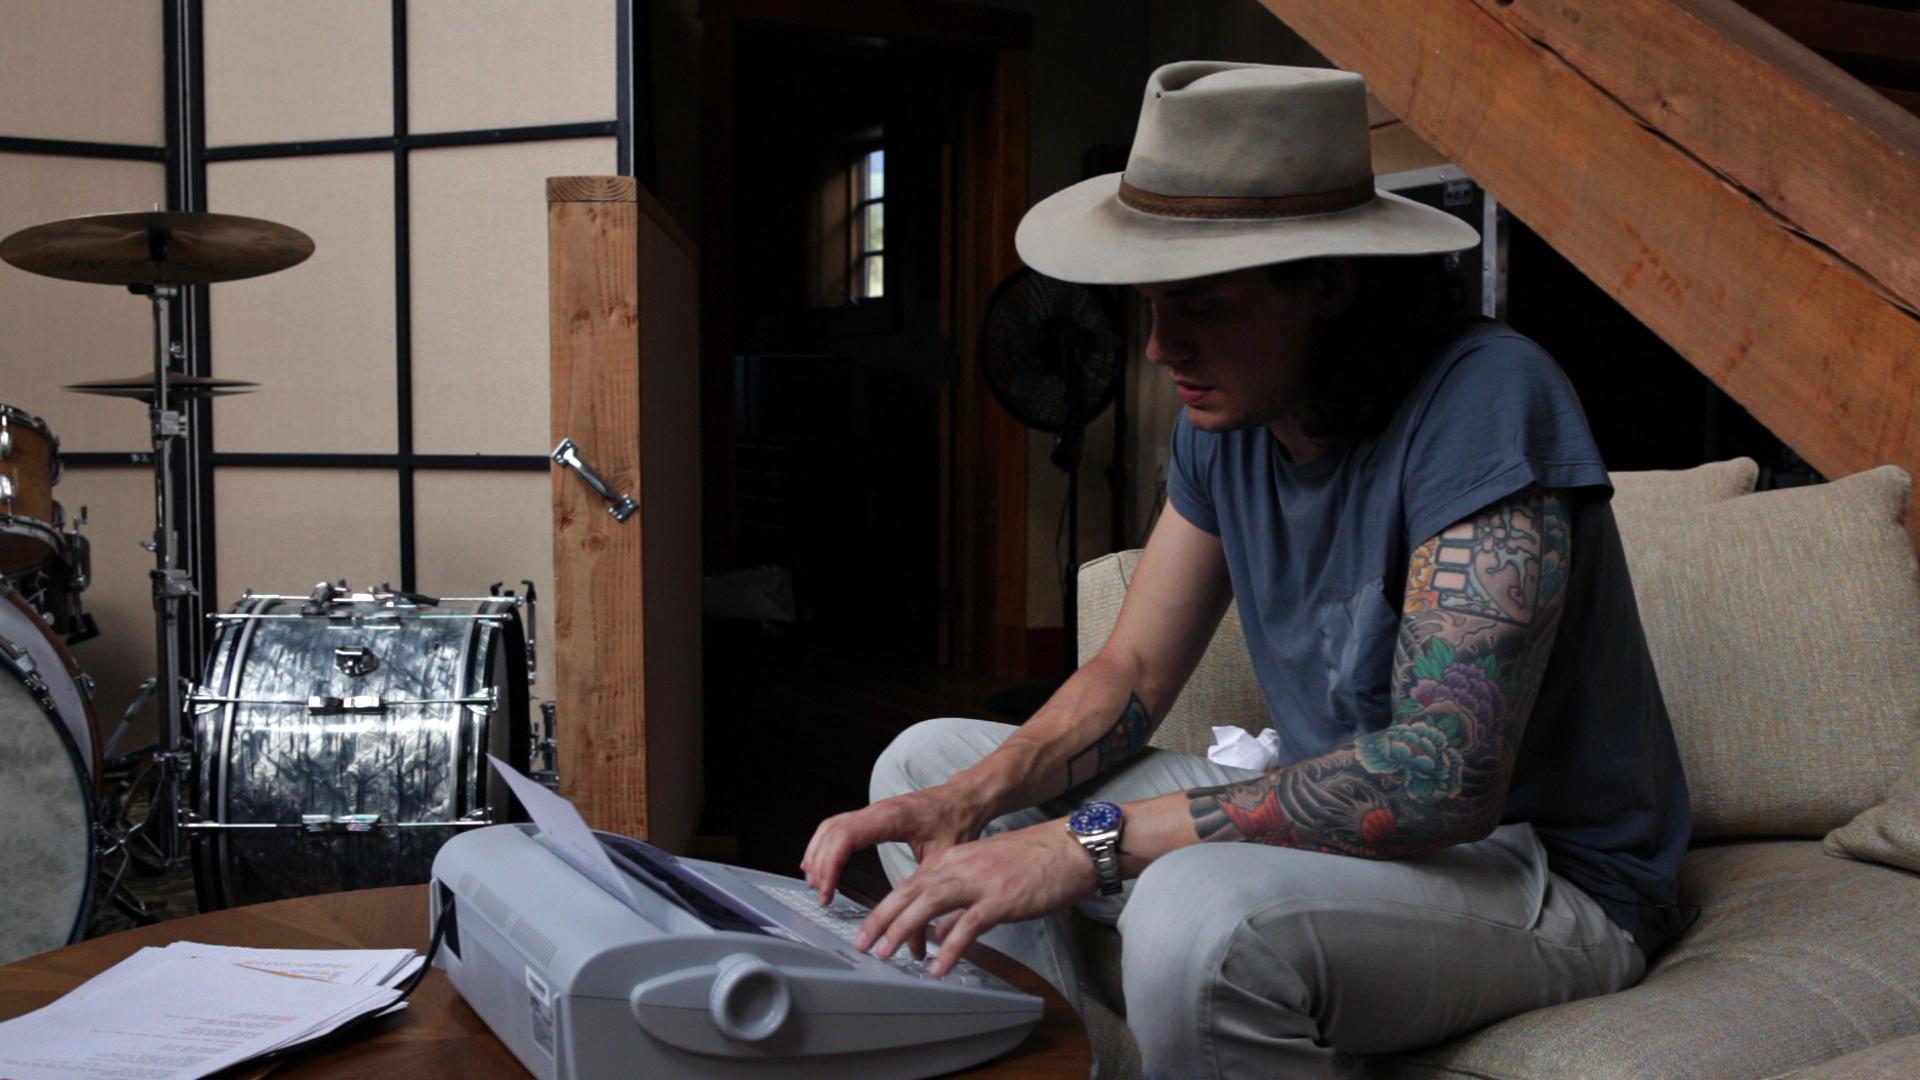 John Mayer types a song